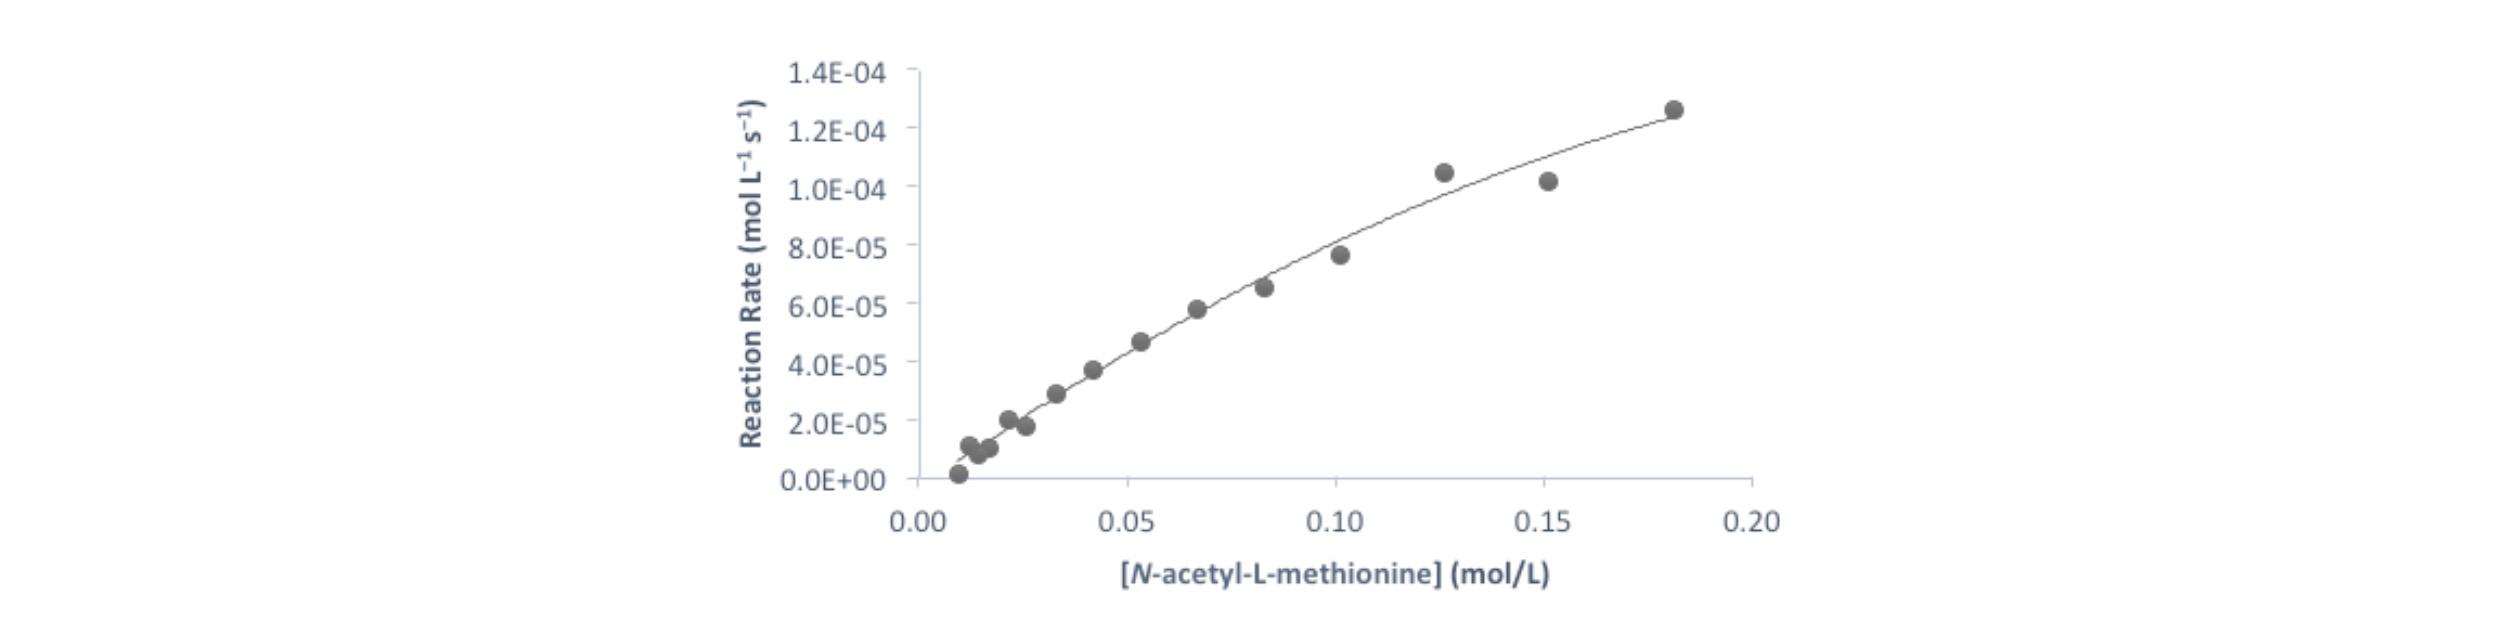 Figure 3.  Michaelis-Menten plot of the reaction.